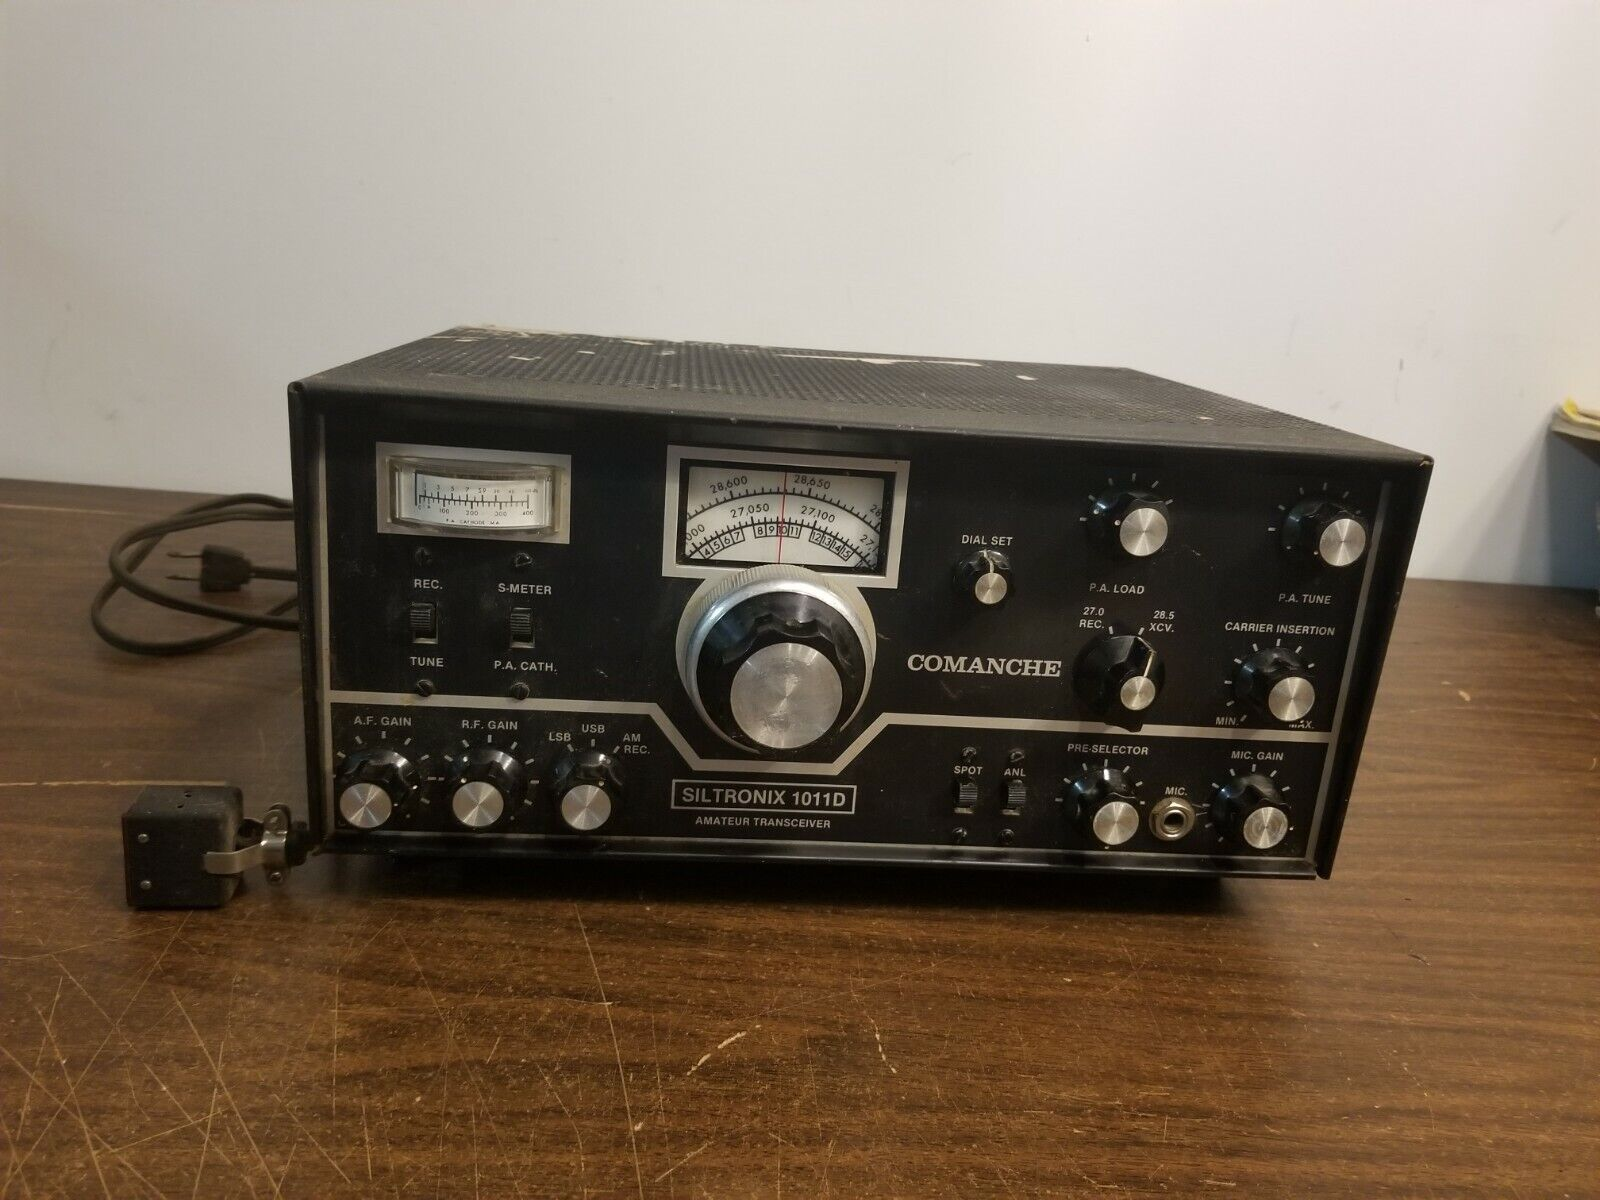 Comanche Siltronix 1011D Amateur Transceiver Ham Radio Powers Up For Parts. Available Now for 279.99